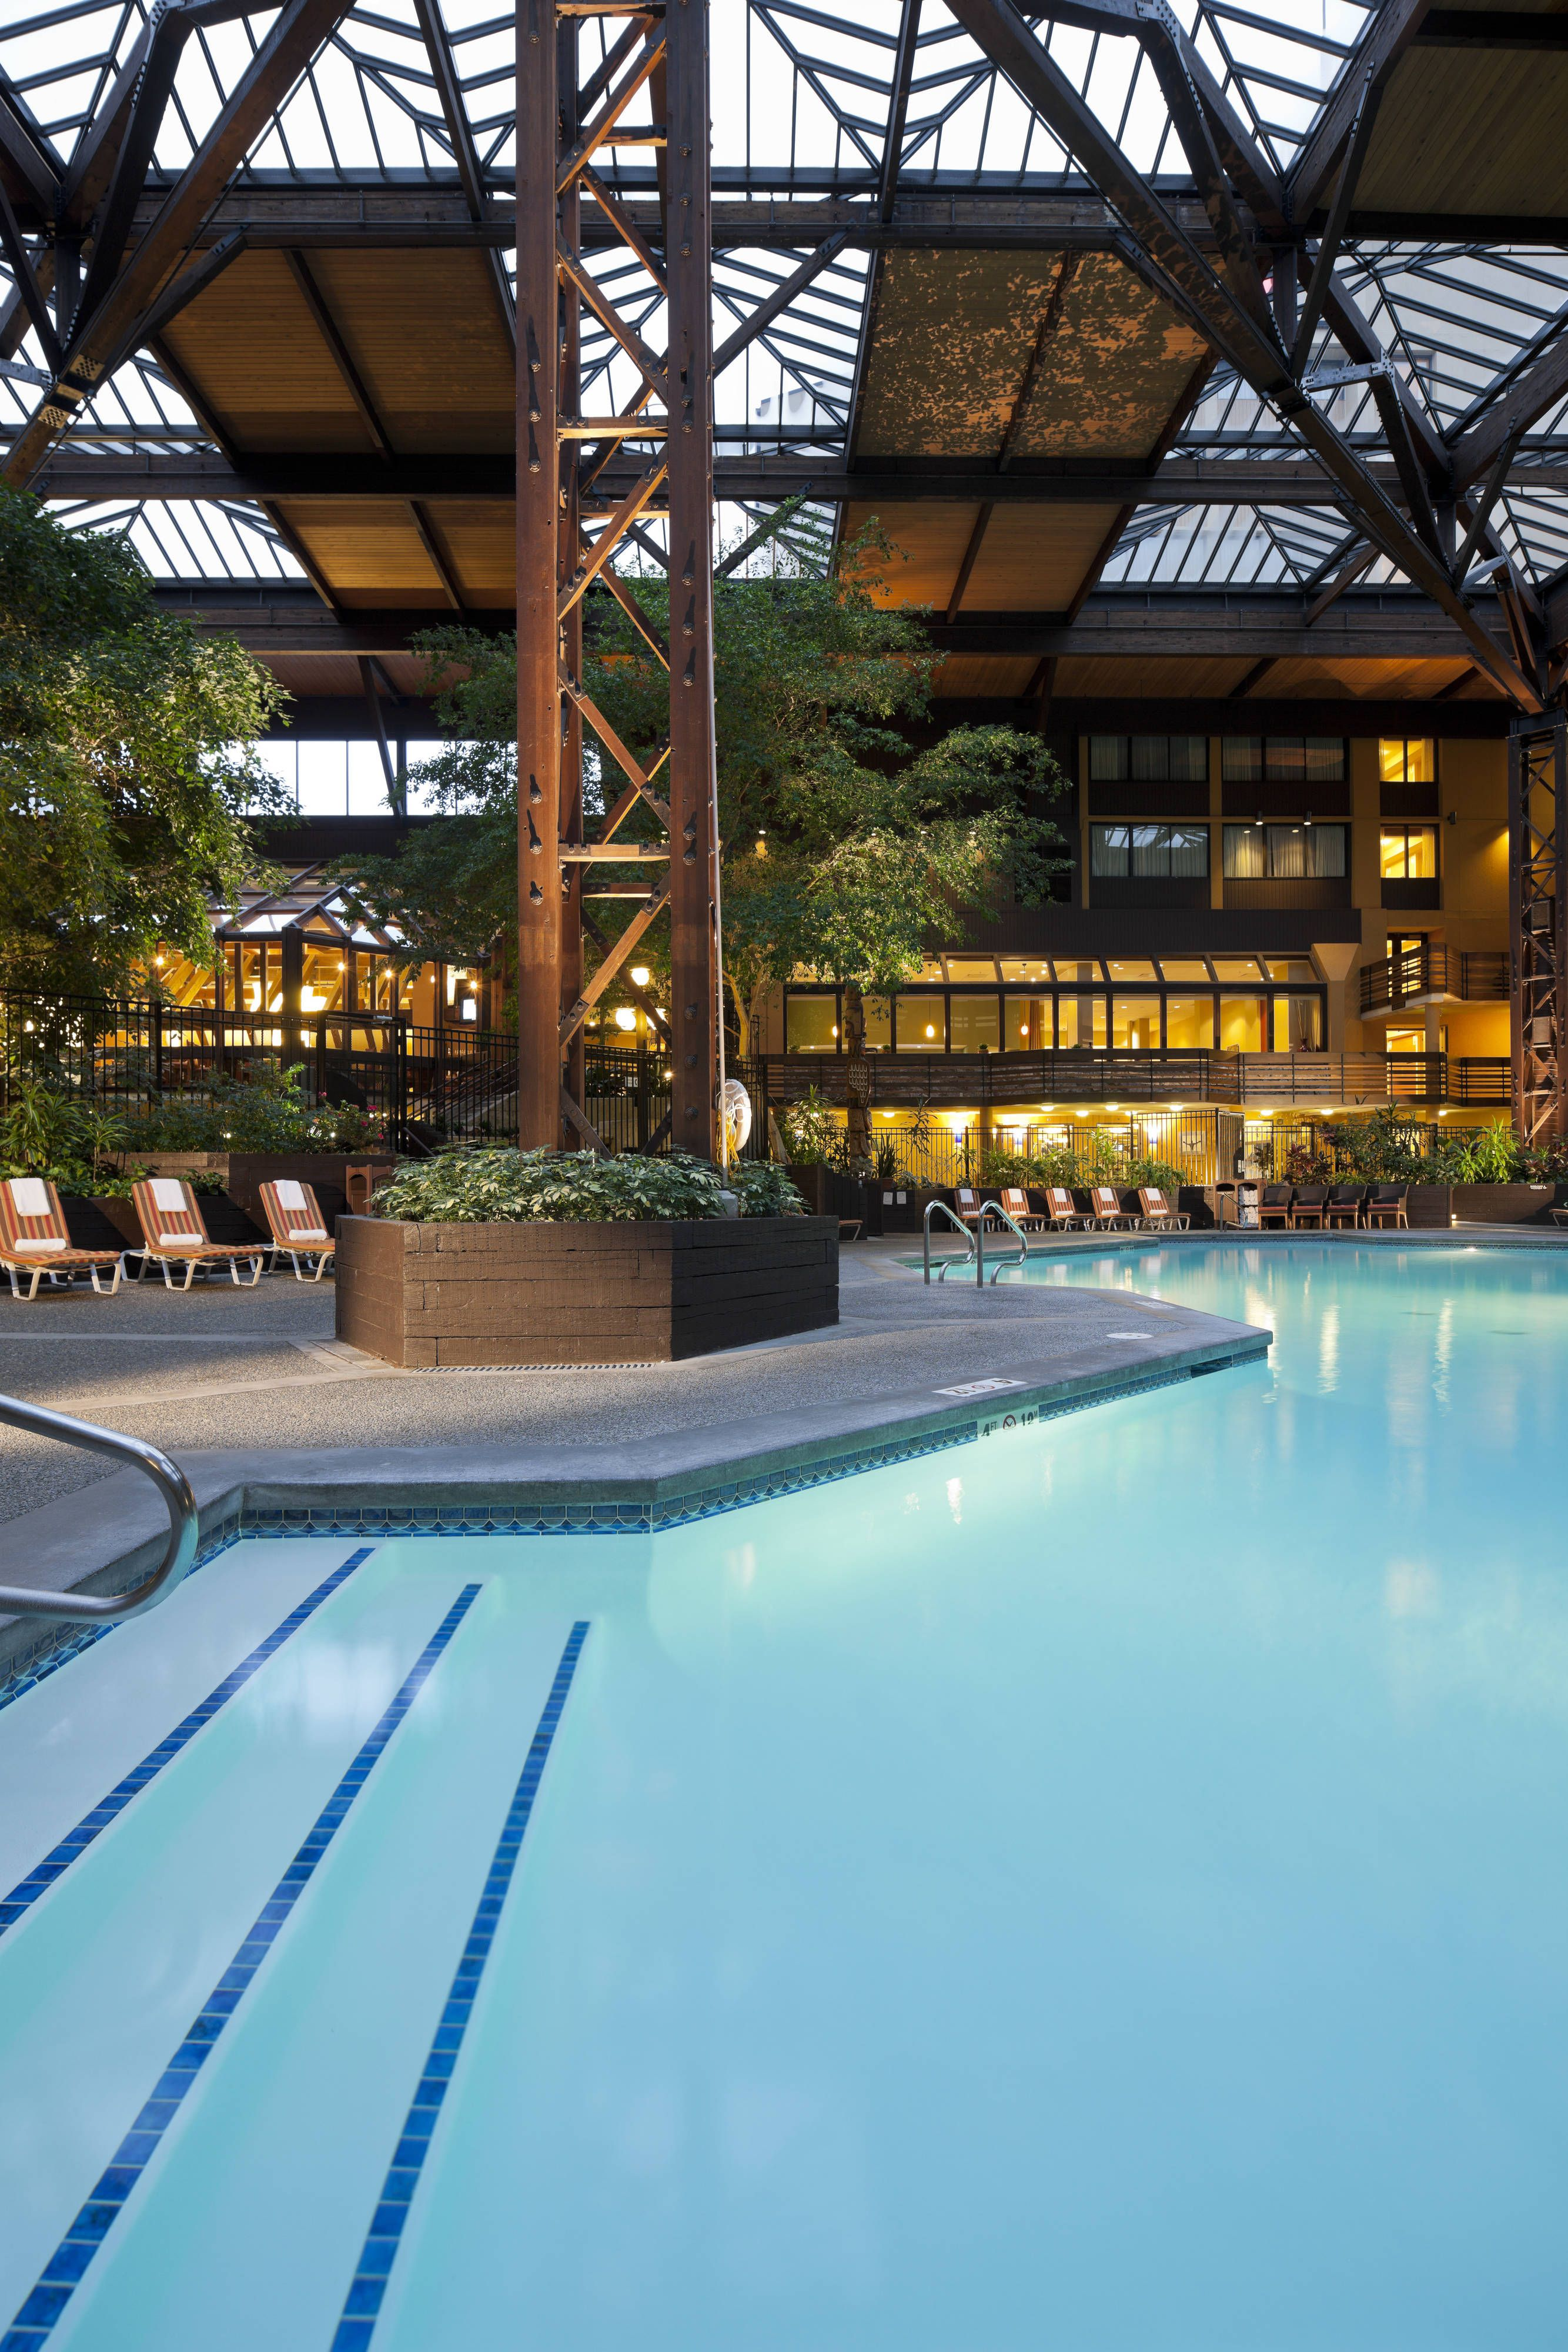 Seattle Airport Marriott Indoor Pool Travel Beautiful Traveling